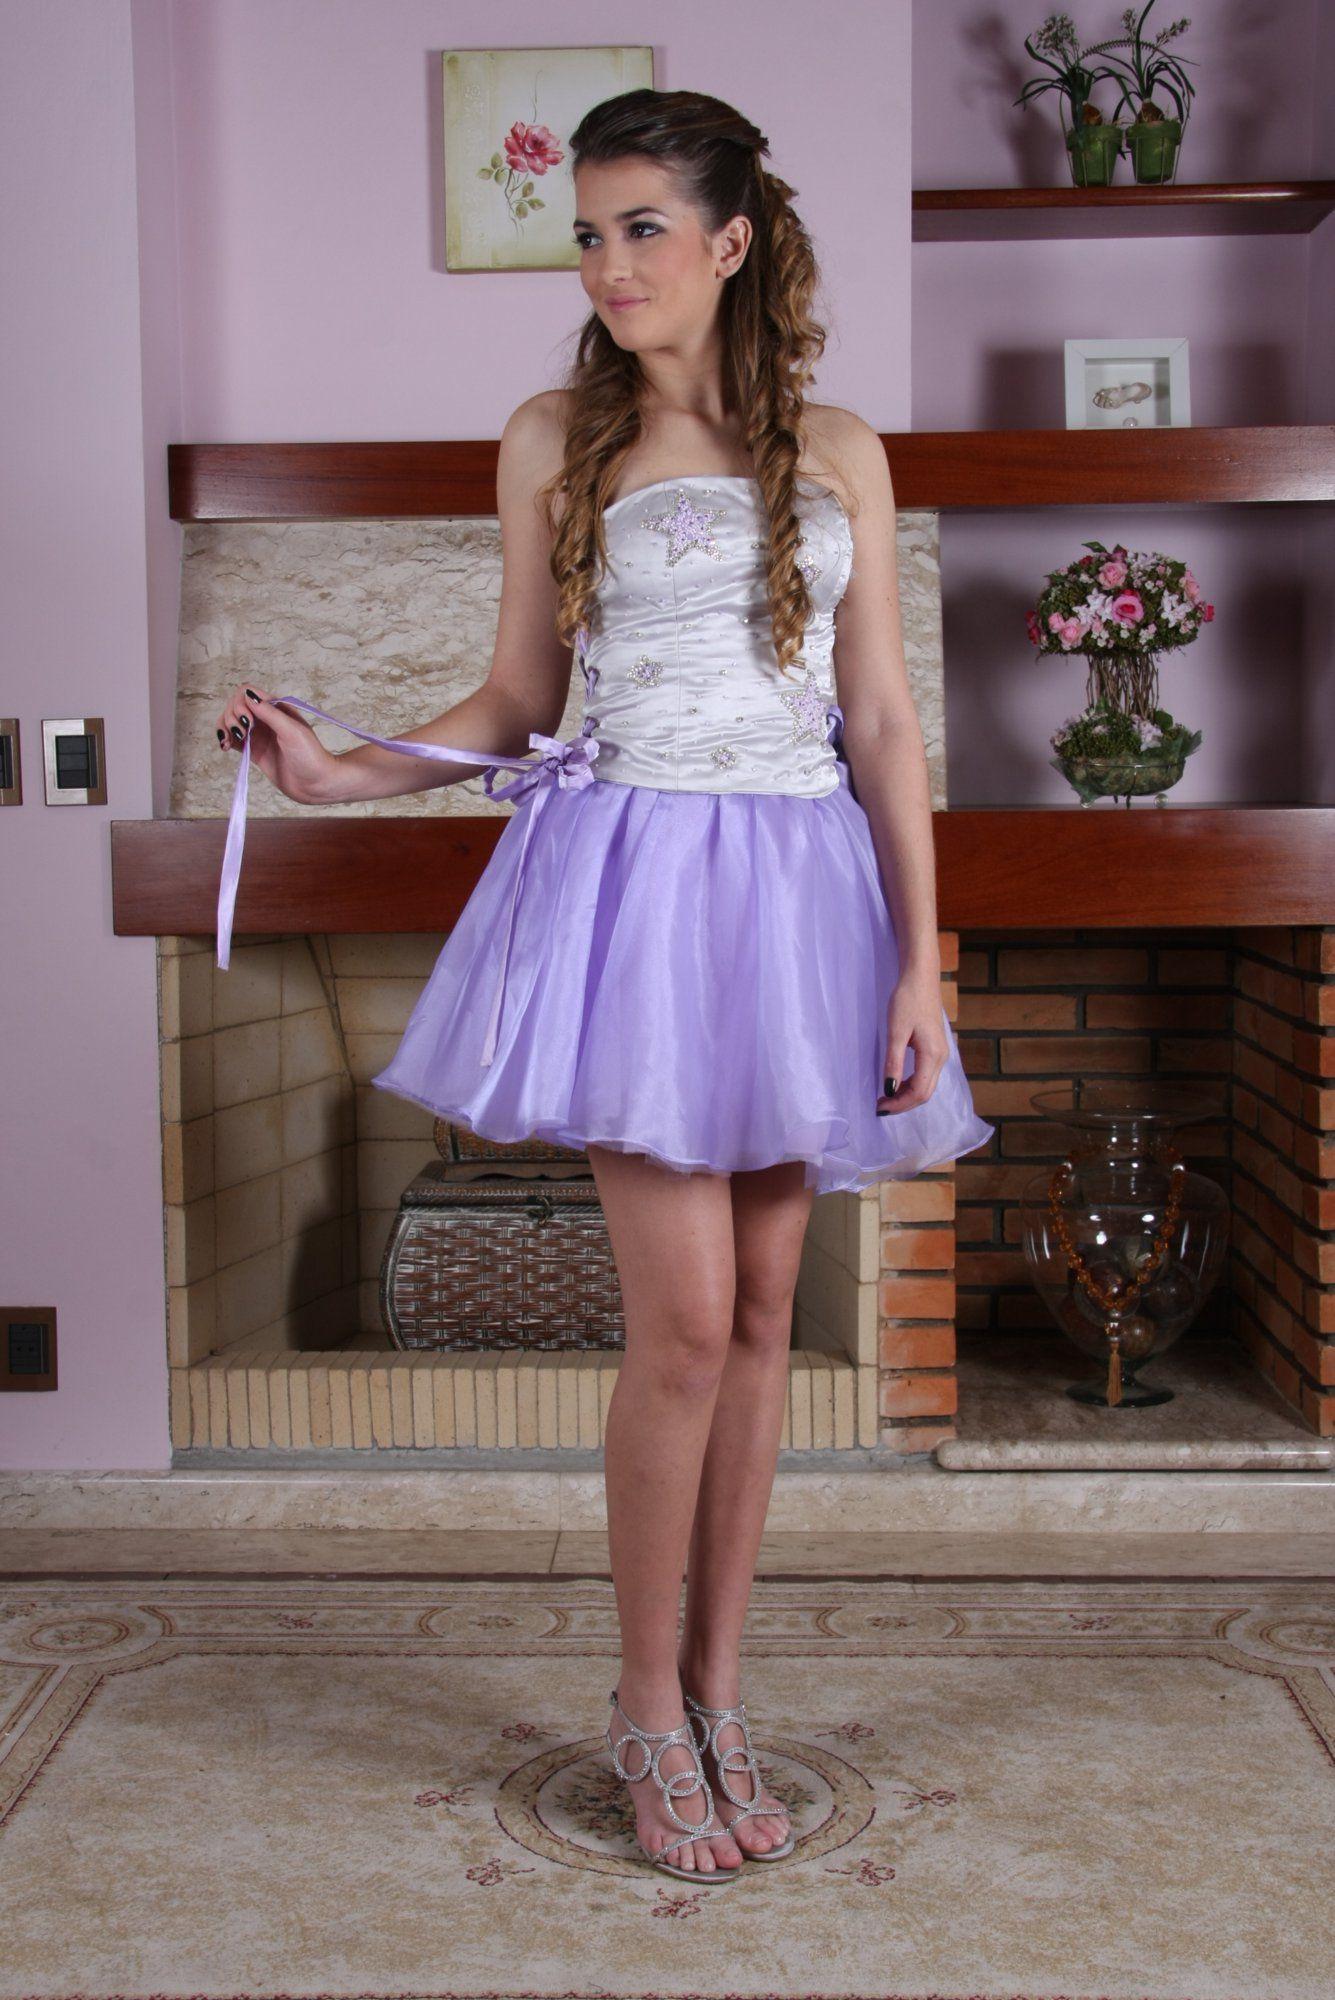 Vestido de Debutante Lilas - 11 - Hipnose Alta Costura e Spa para Noivas e Noivos - Campinas - SP Vestido de Debutante, Vestido de Debutante Lilas, Hipnose Alta Costura